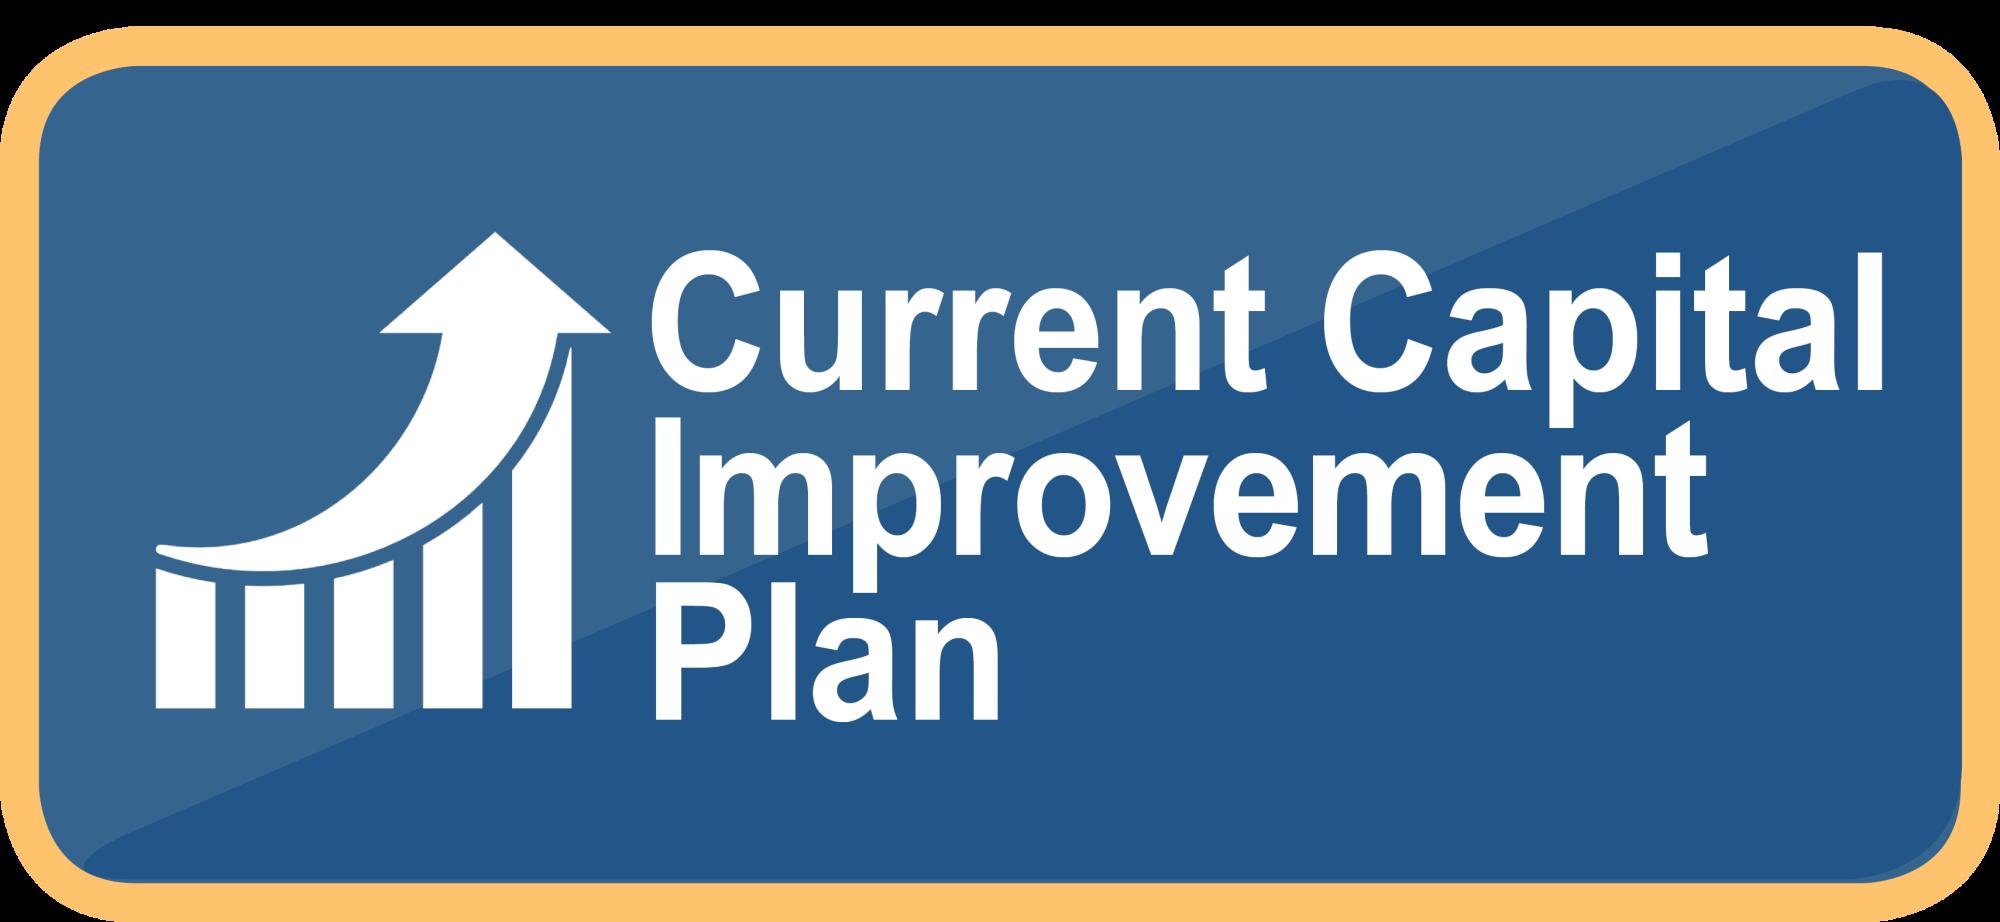 Current Capital Improvement Plan